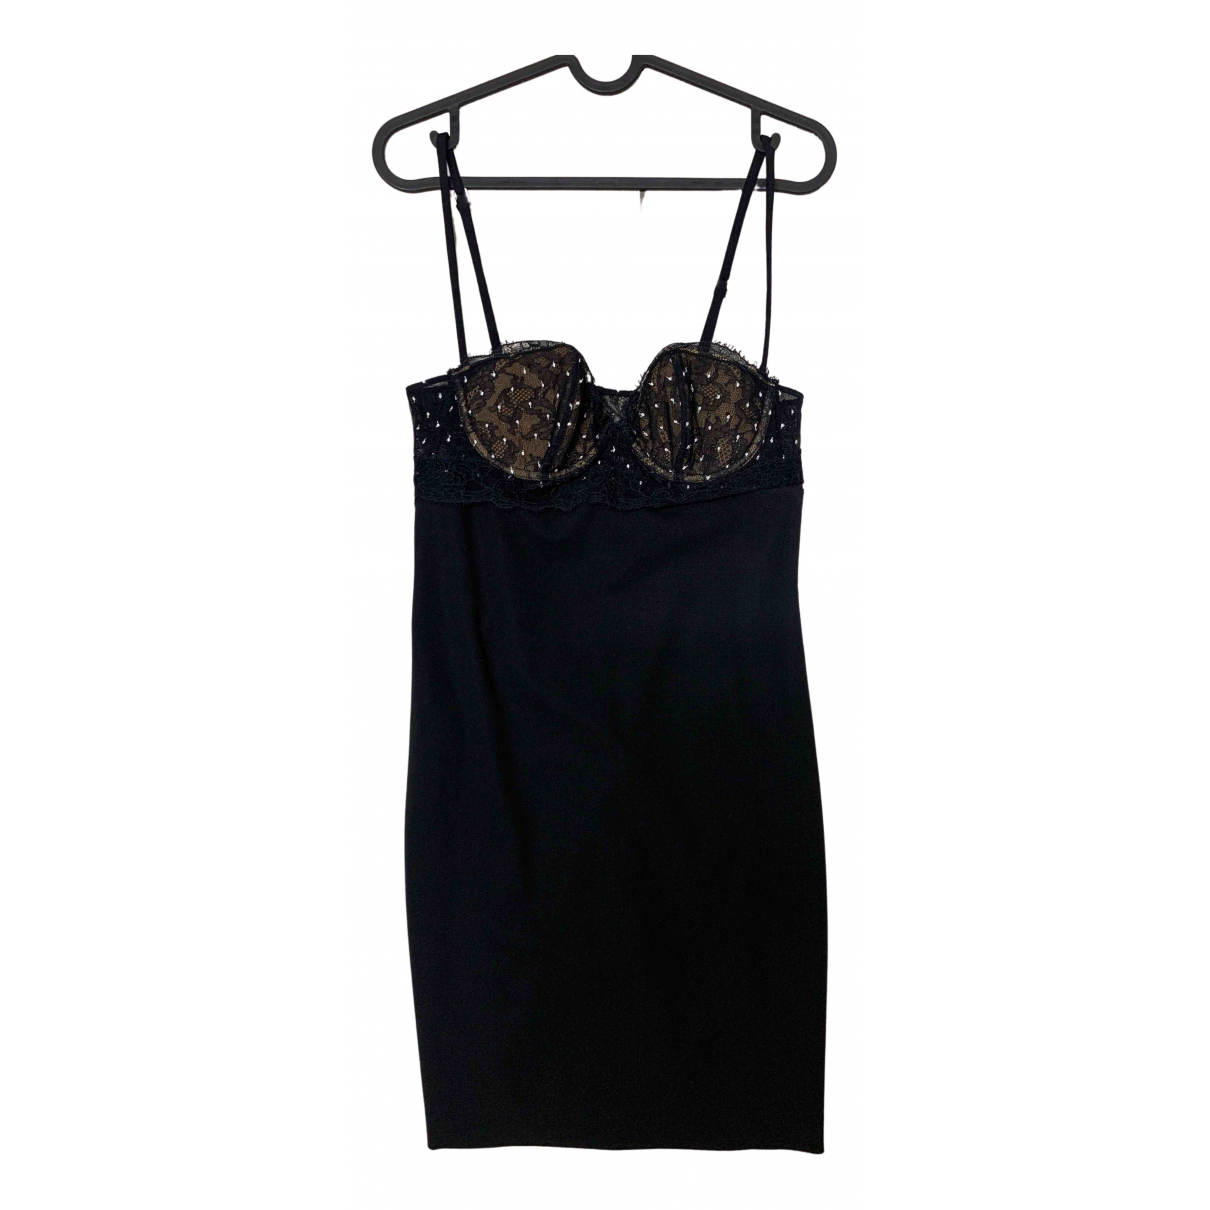 La Perla \N Kleid in  Schwarz Baumwolle